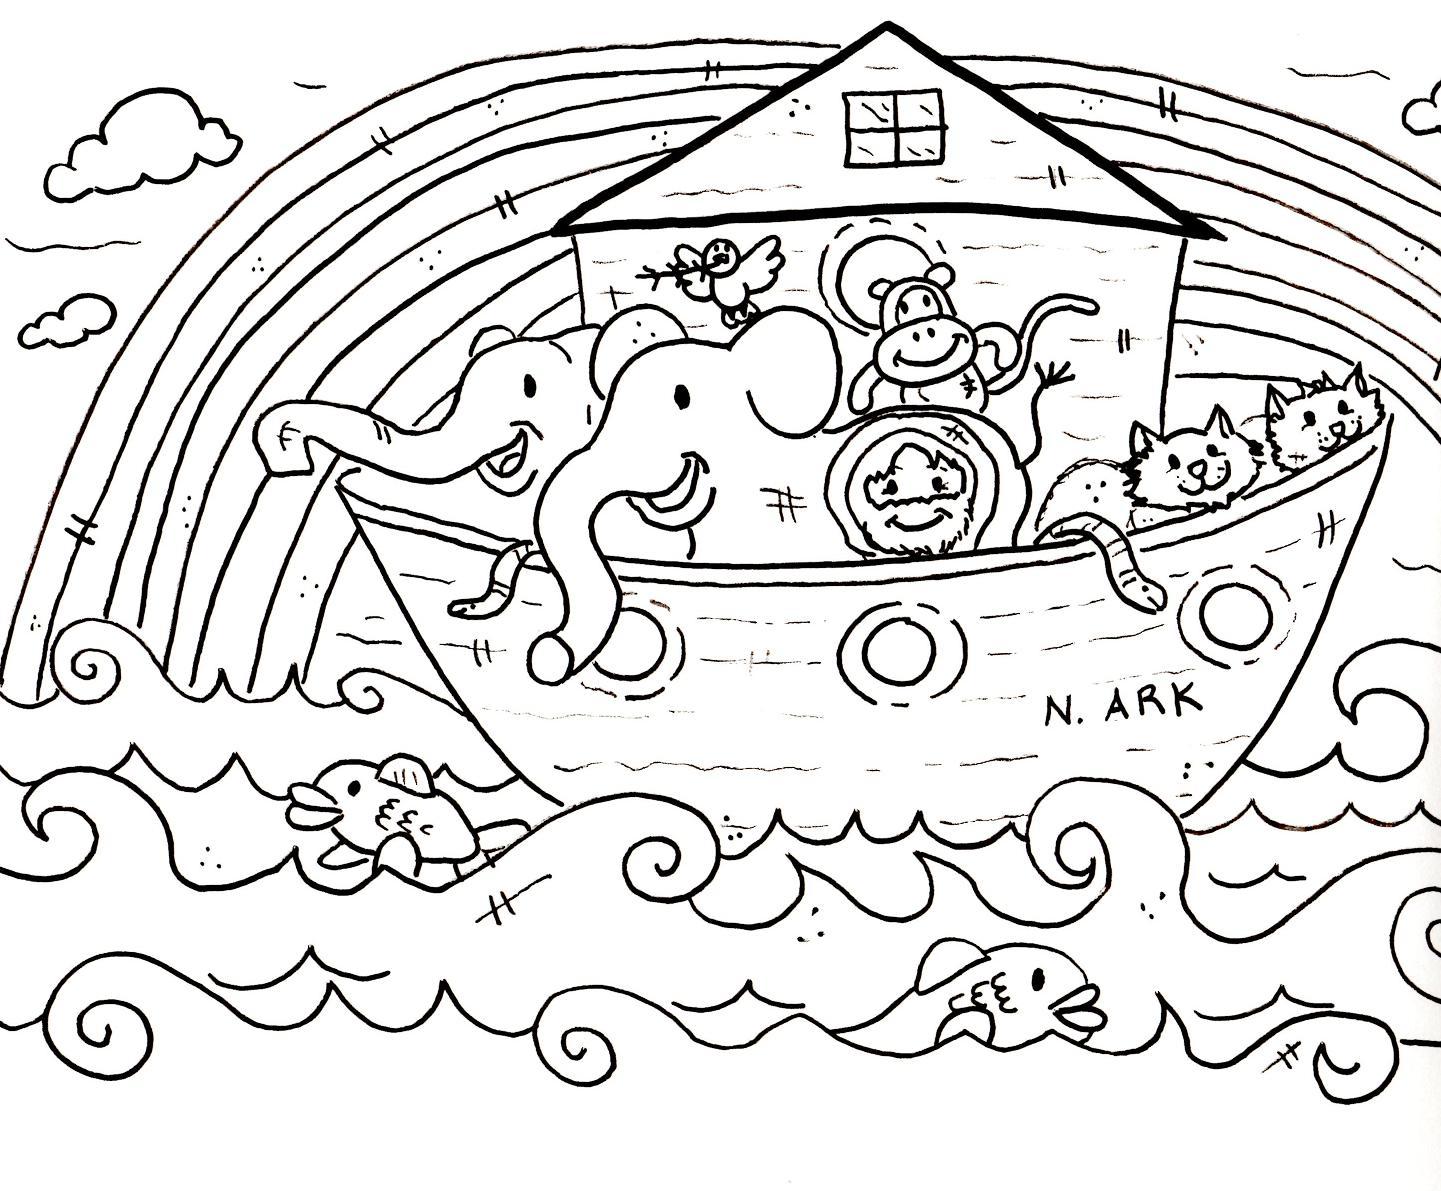 Noah Ark Drawing At Getdrawings